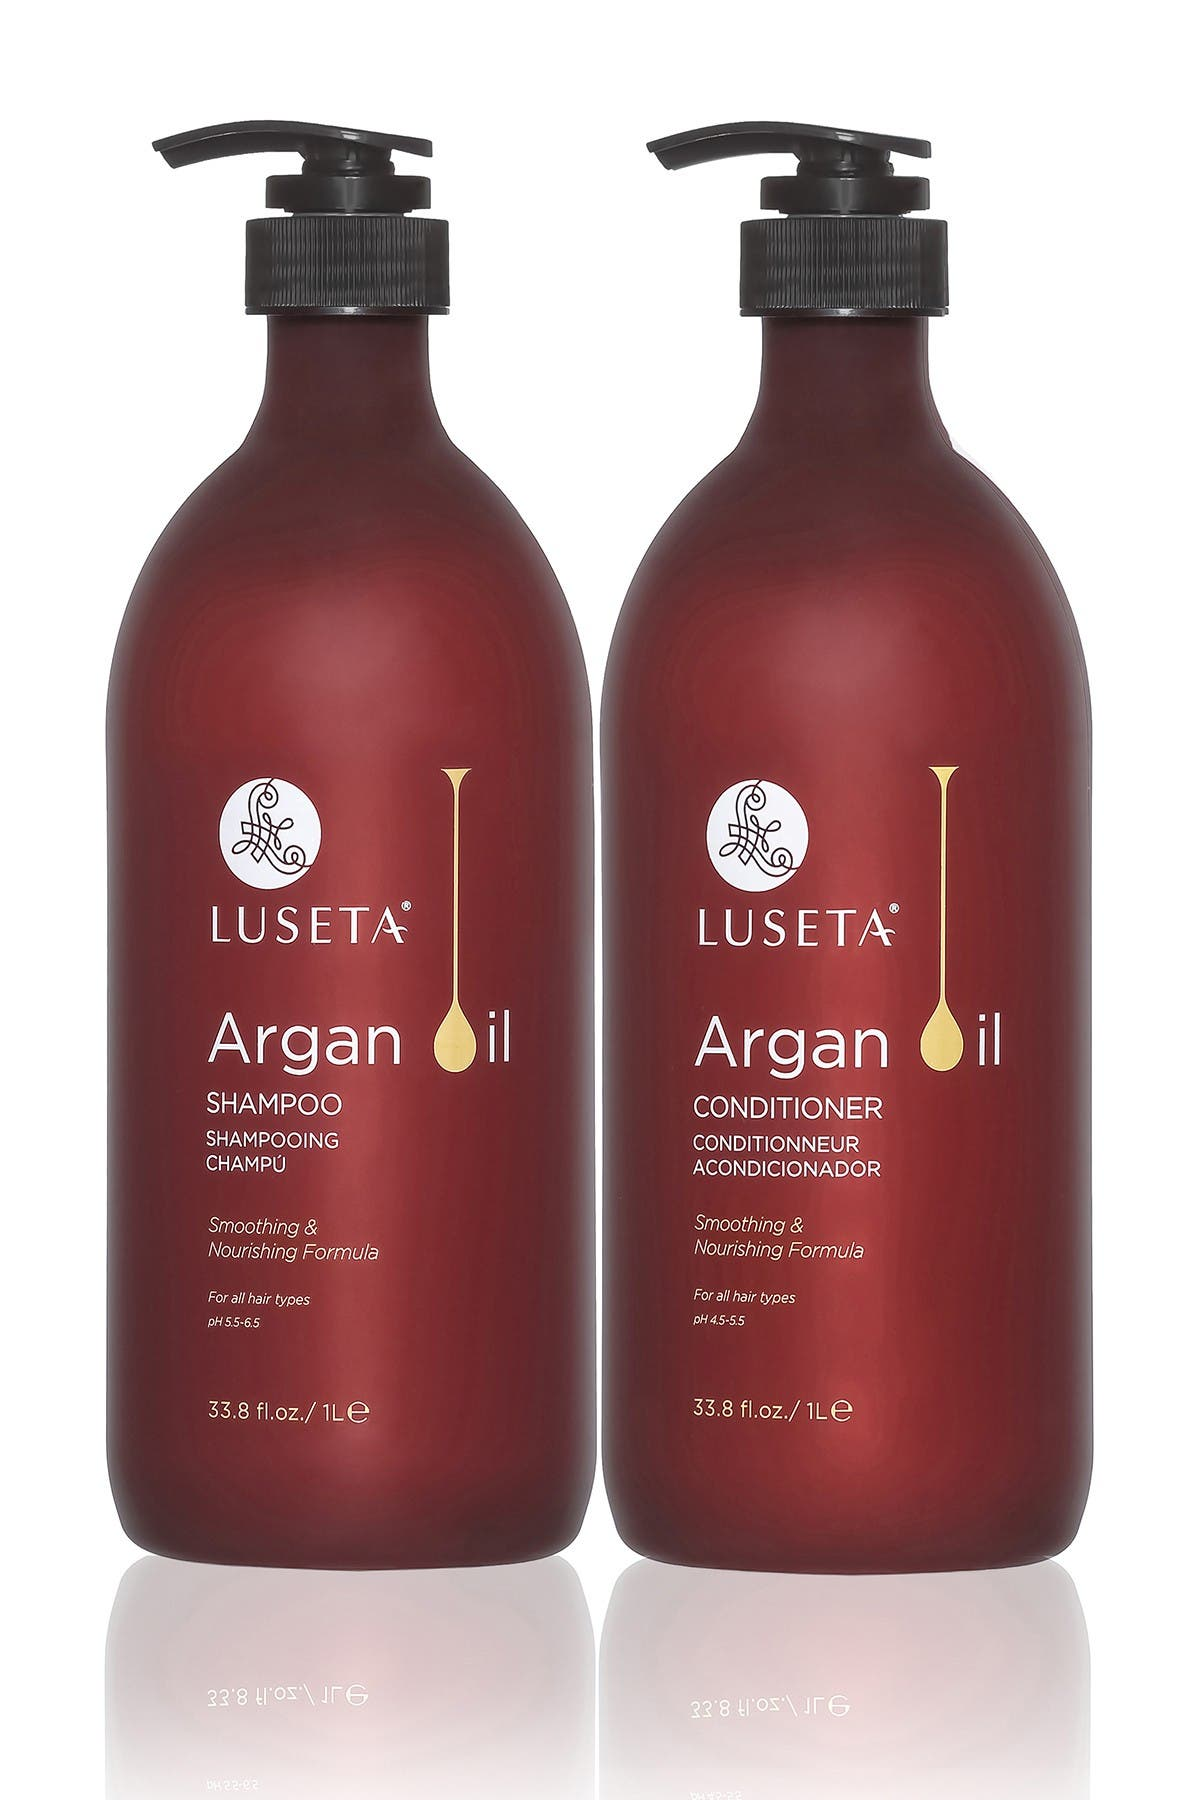 Image of Luseta Beauty Argan Oil Moisture Shampoo & Conditioner 2-Piece Set - 33.8 oz.